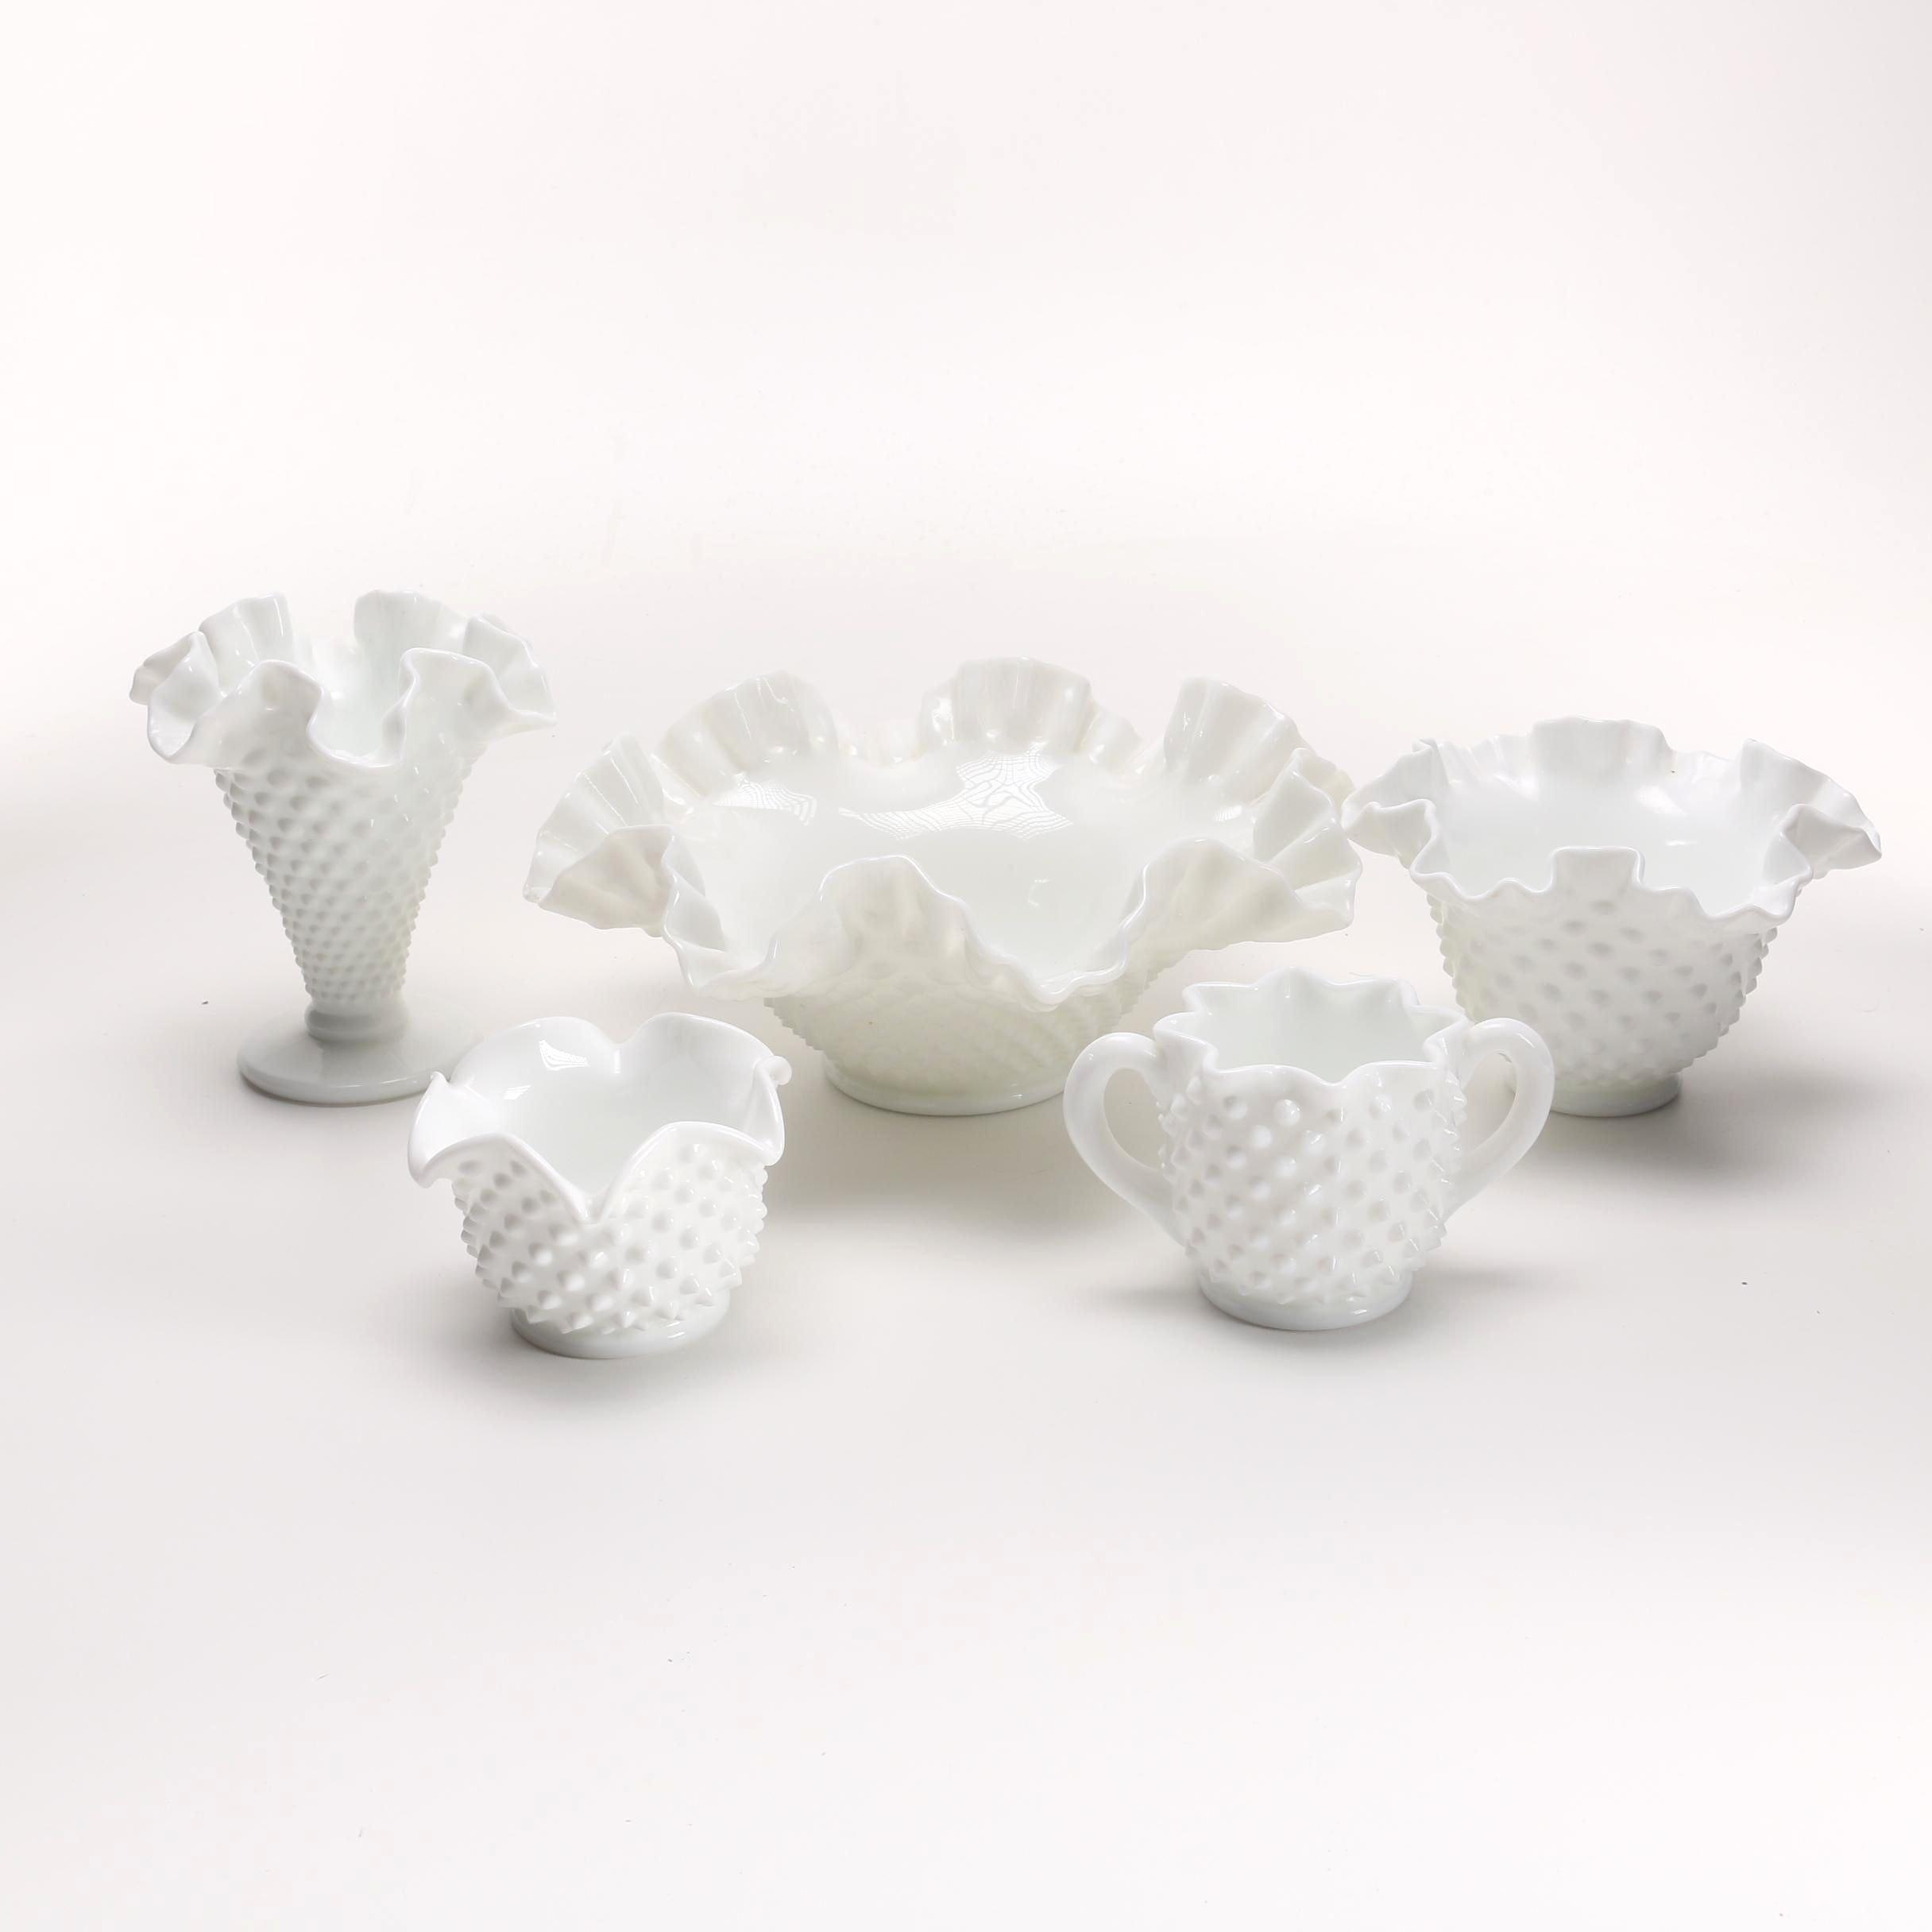 Assortment of Milk Glass